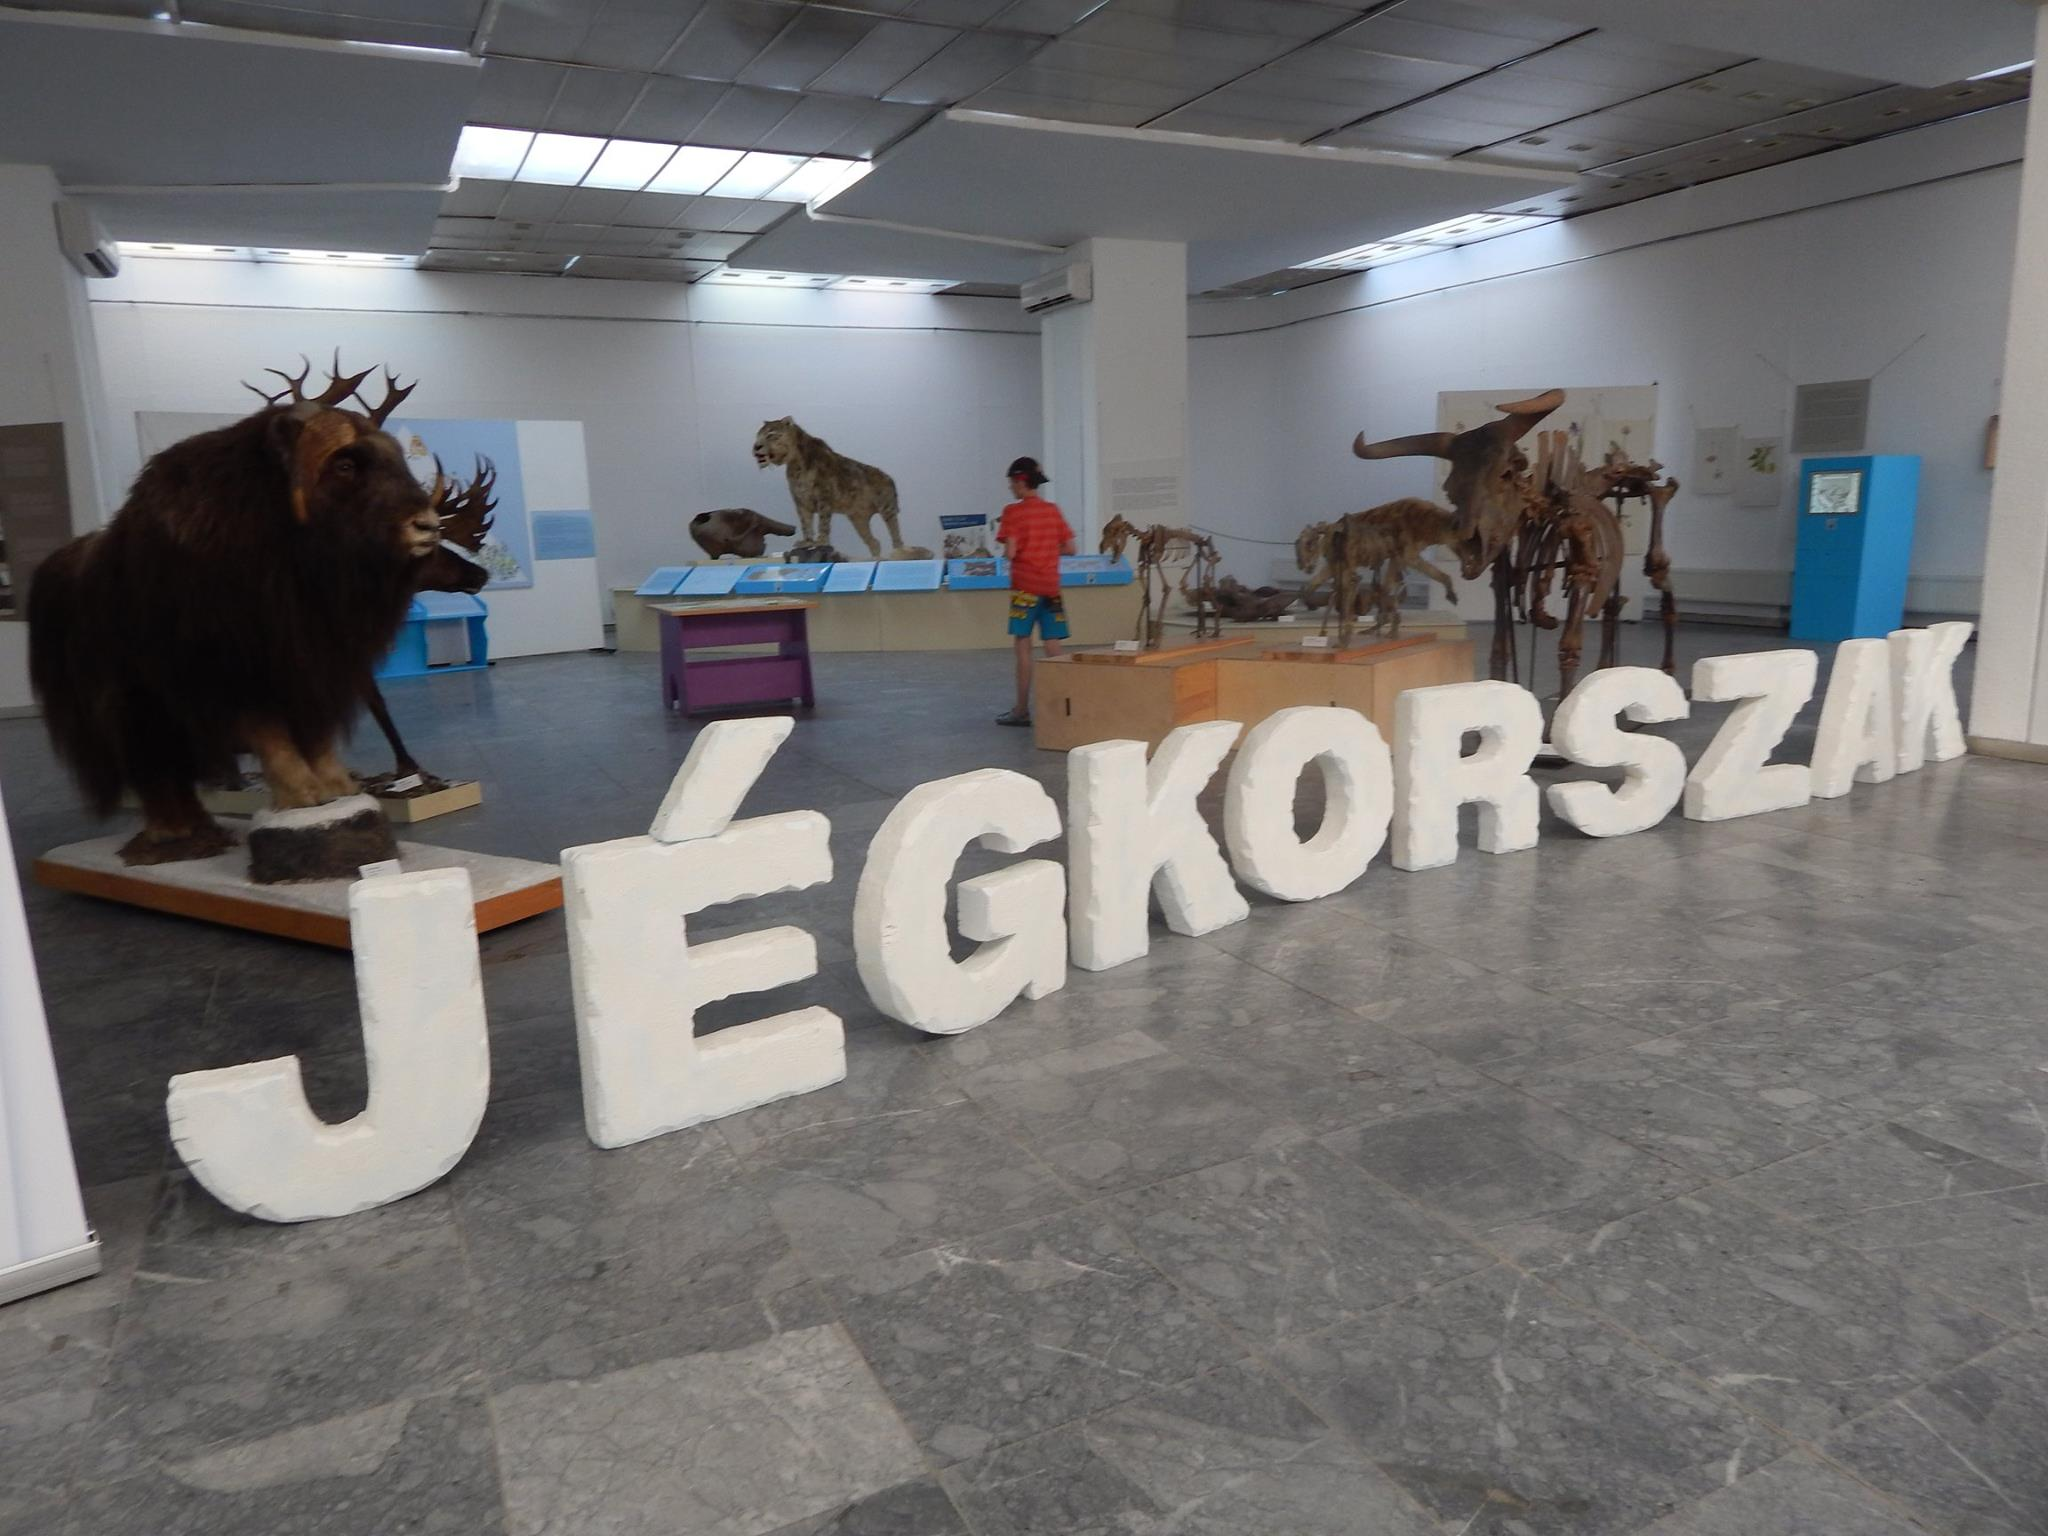 jegkorszak_Dornyay_Bela_Muzeum.jpg